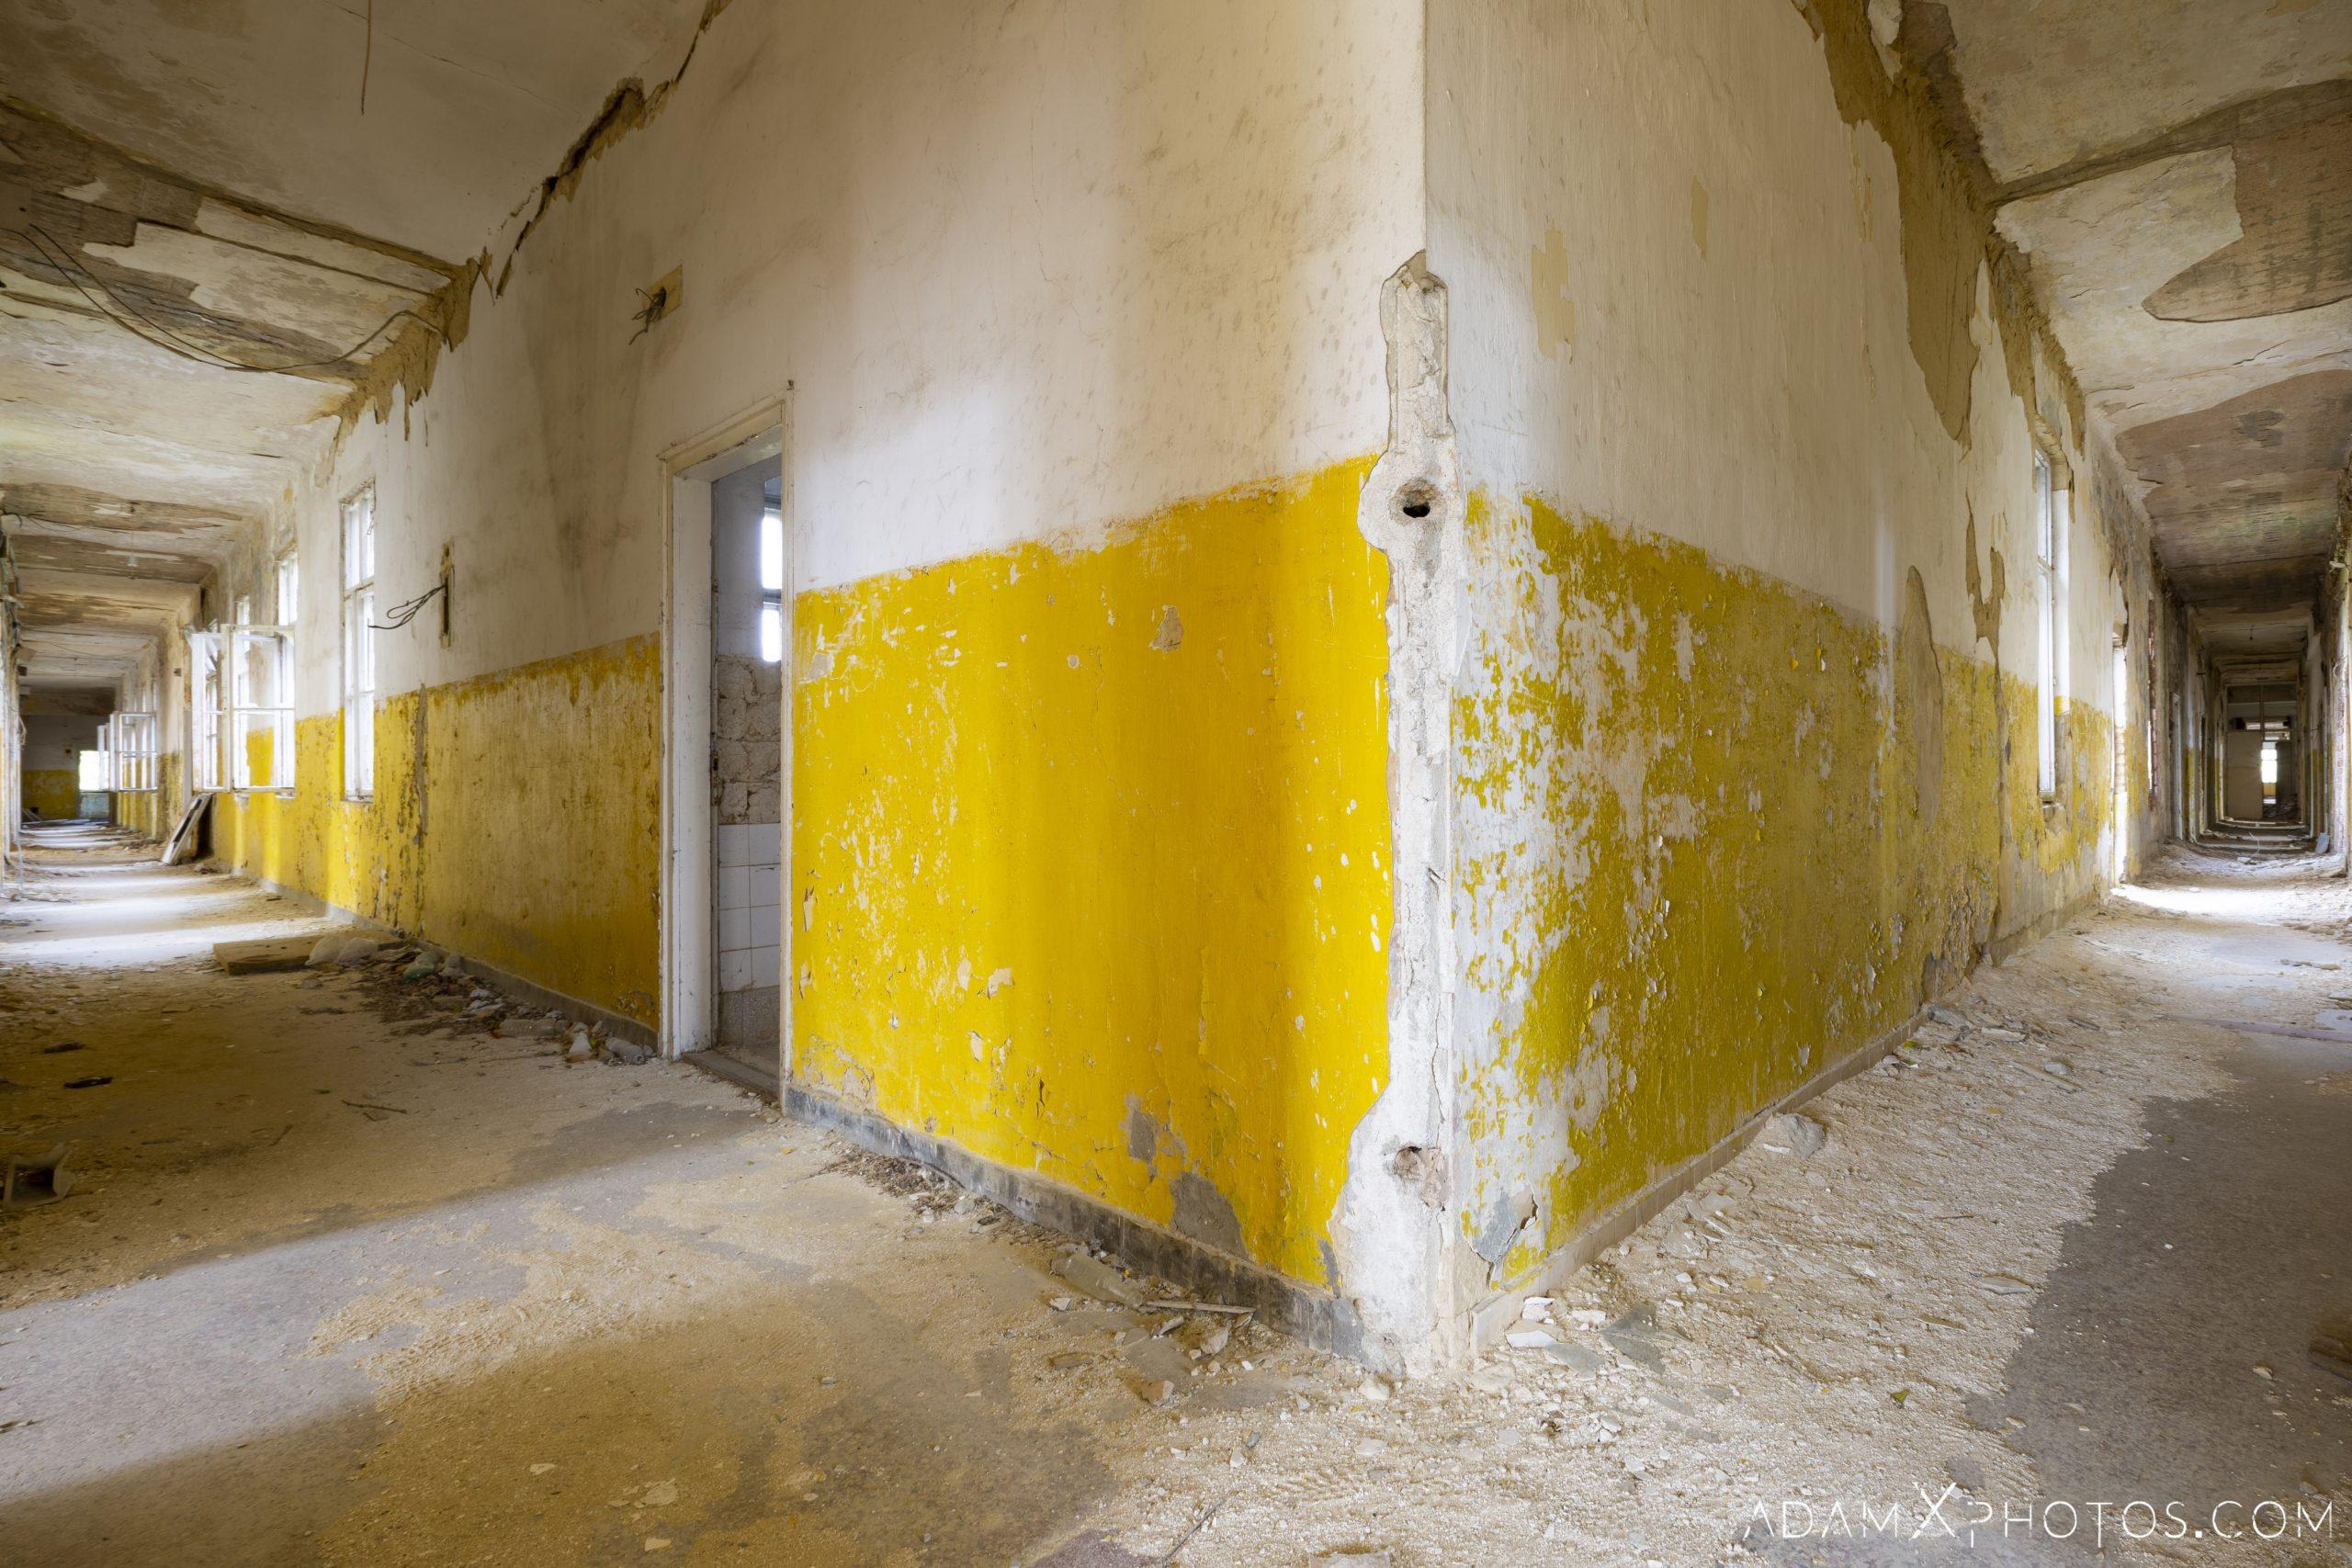 Yellow split twin corridor Hajmaskér Barracks Hungary Adam X Urbex Urban Exploration Access 2018 Abandoned decay ruins lost forgotten derelict location creepy haunting eerie